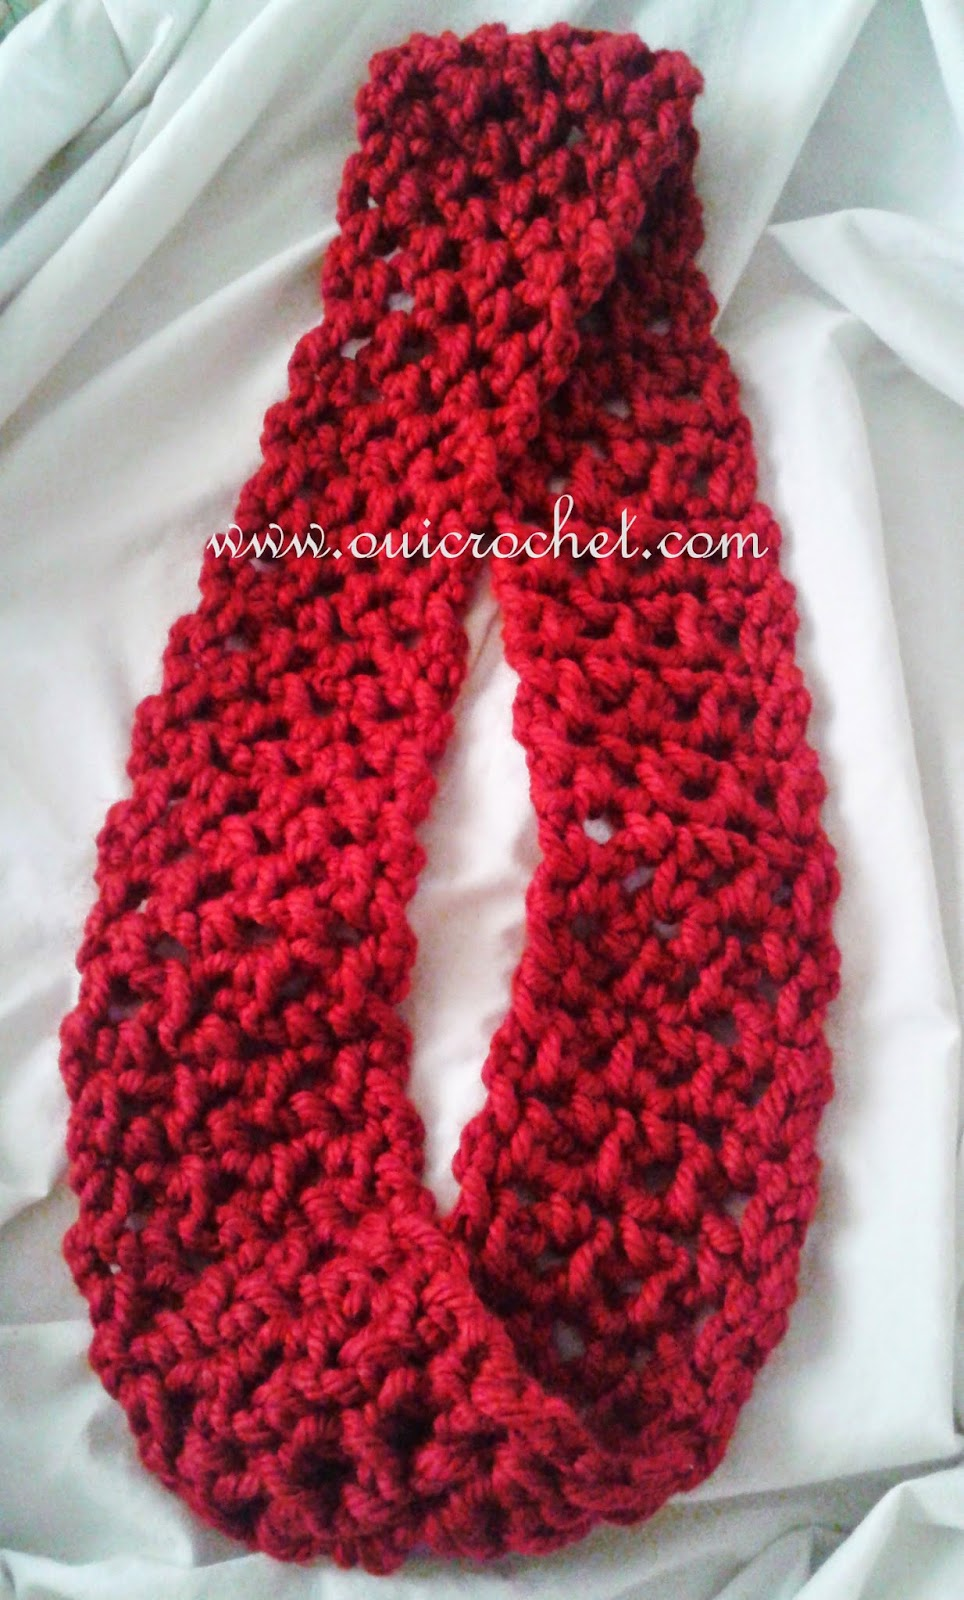 Free Crochet Scarf Patterns Using Bulky Yarn